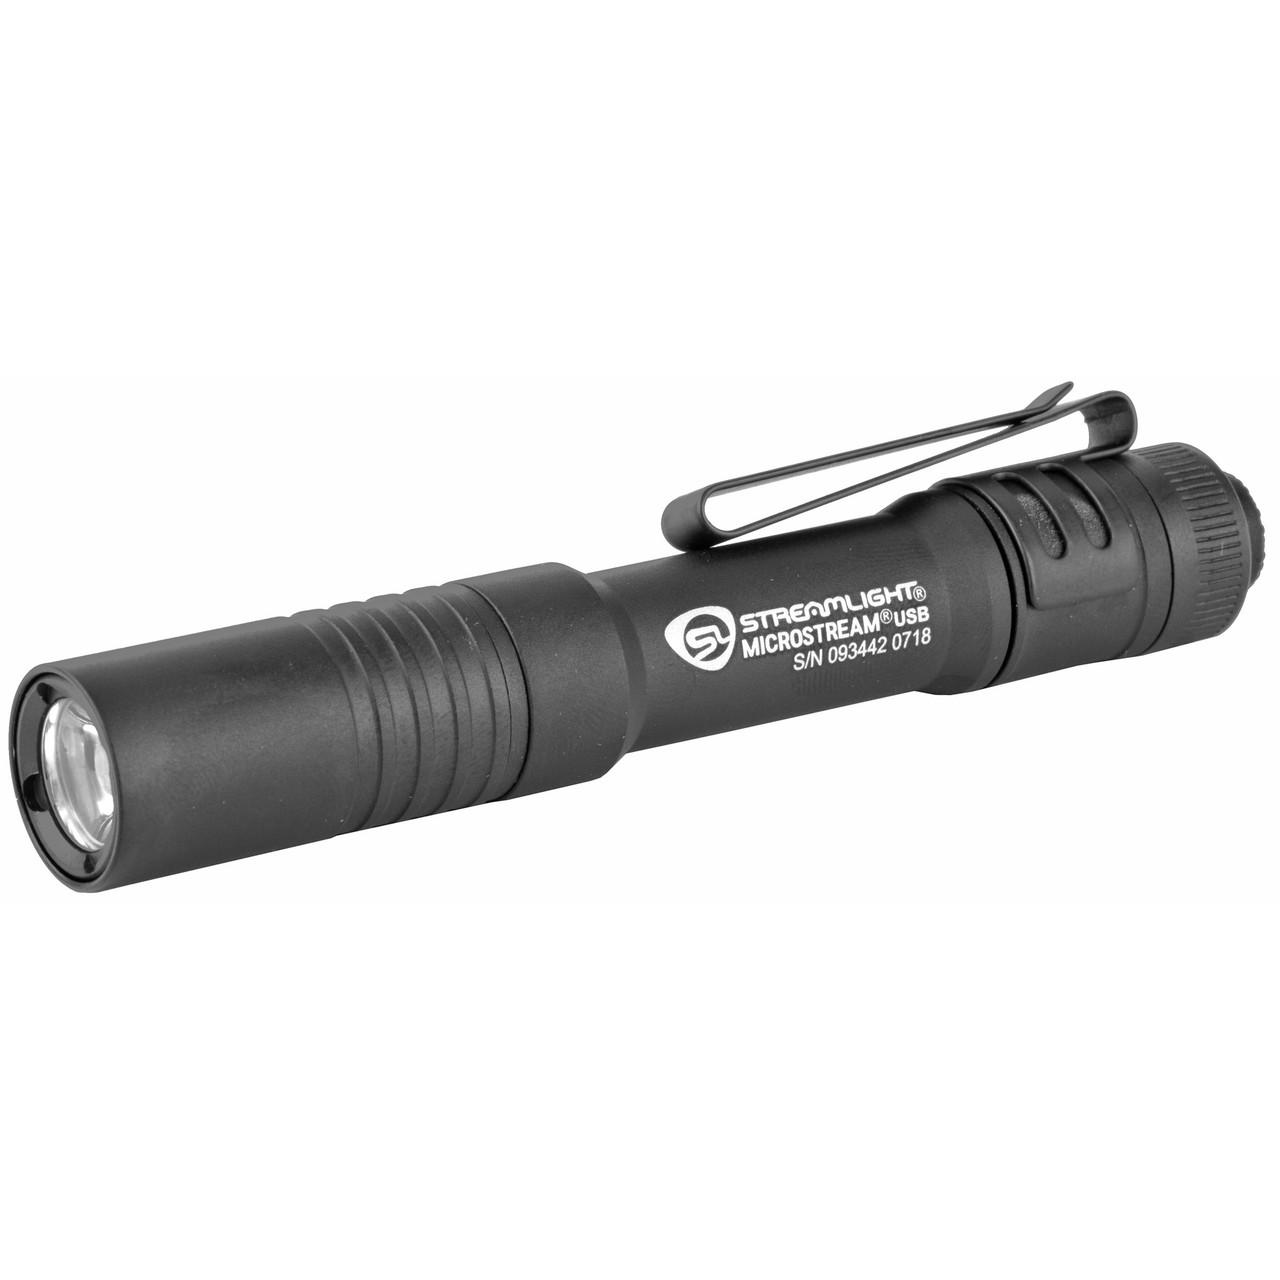 Streamlight Microstream, Flashlight, USB Charging Cord, Black 66601